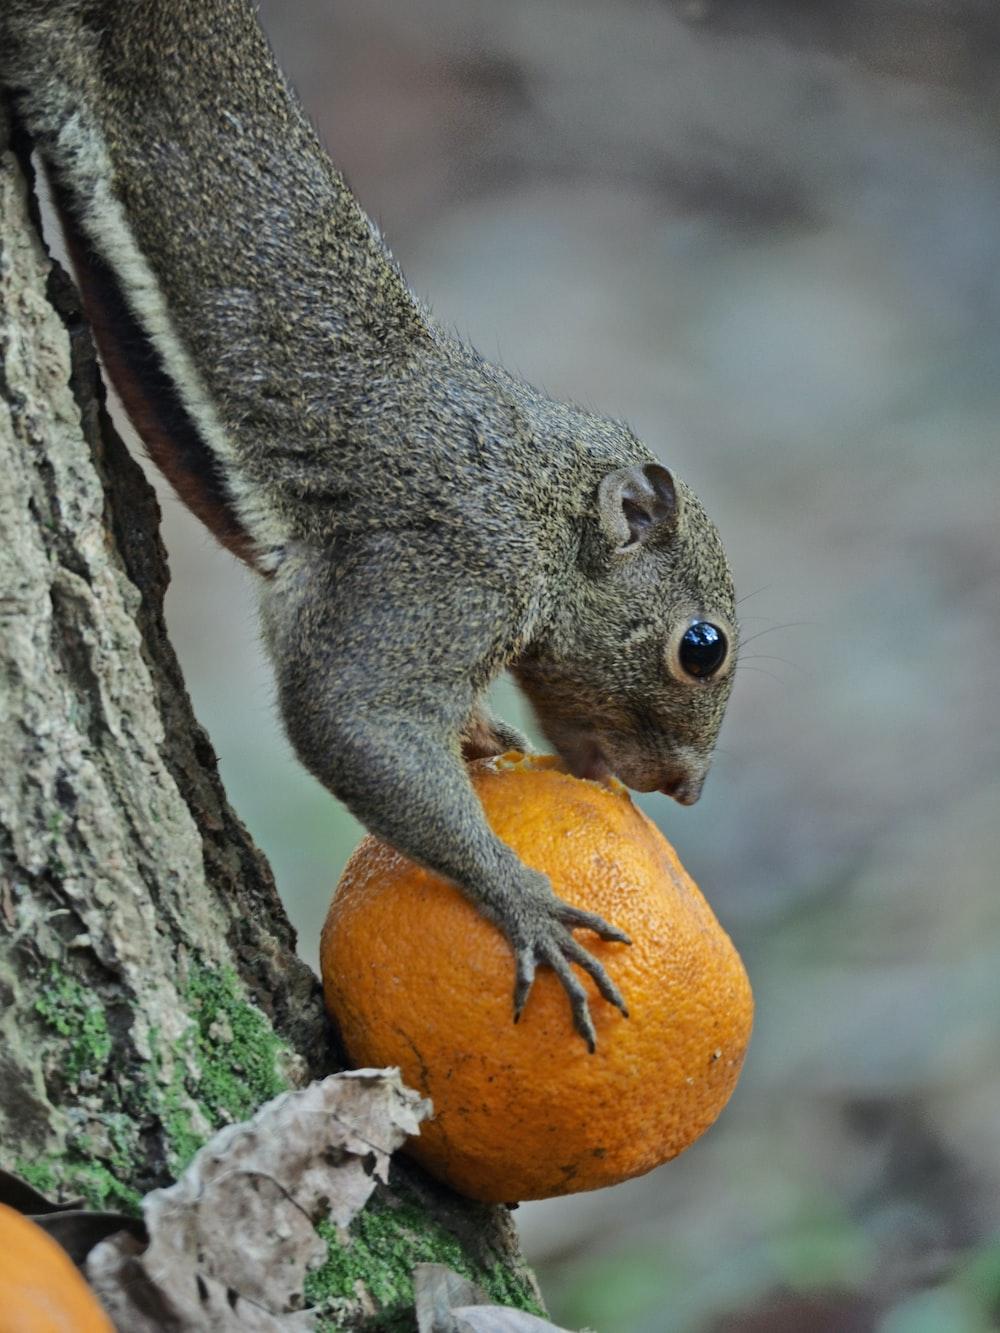 grey rodent eating orange fruit